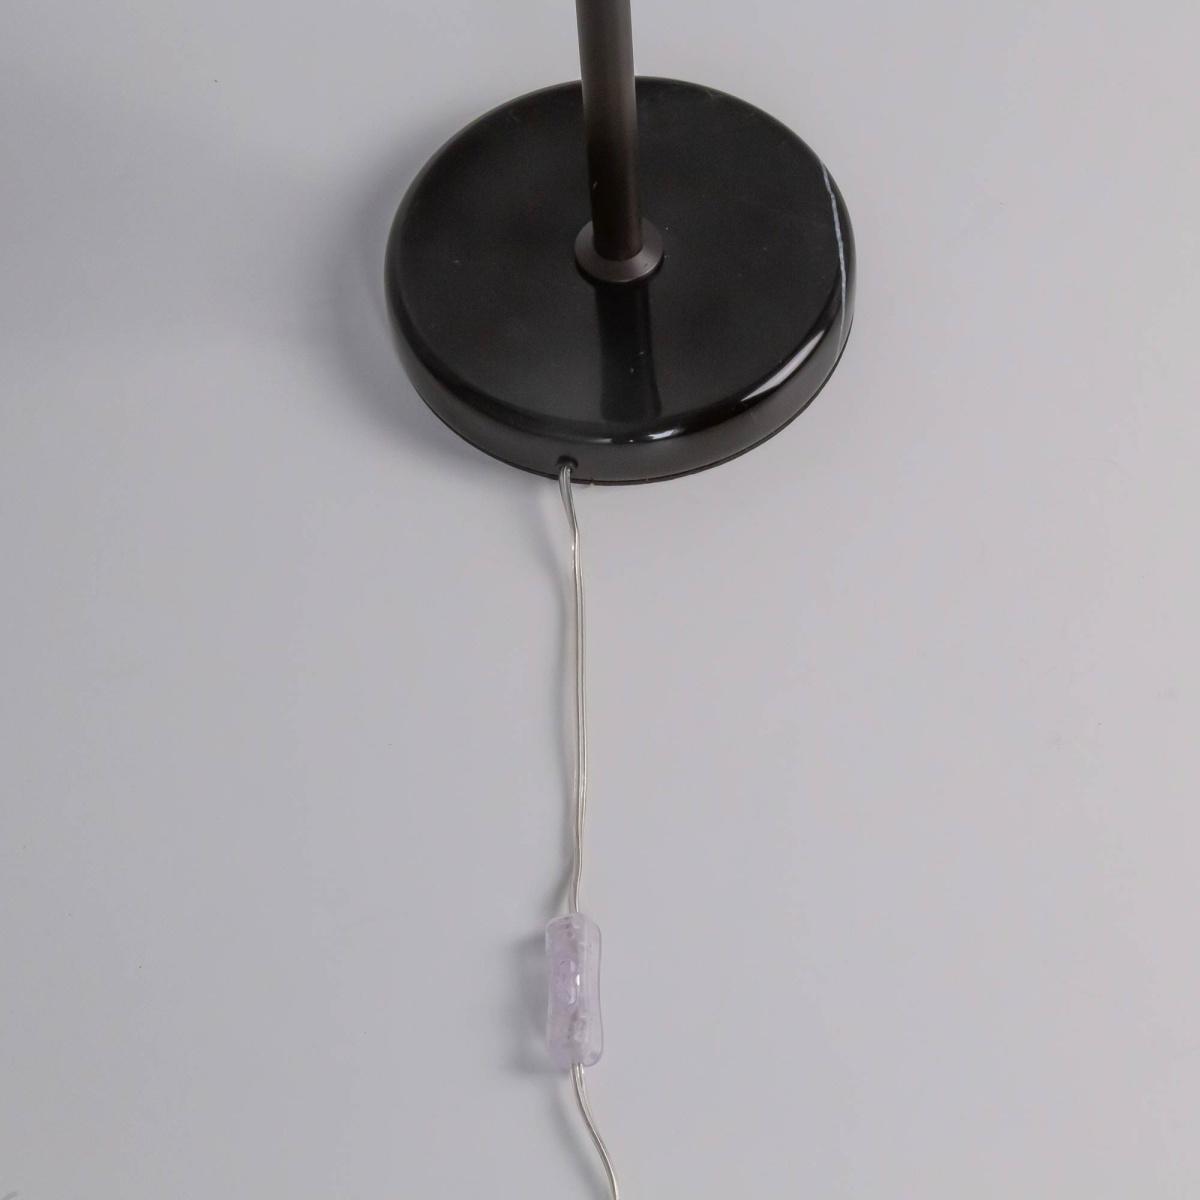 Настольная лампа Citilux Мартин CL332861, 6xE14x60W, венге, прозрачный, металл, хрусталь - фото 2